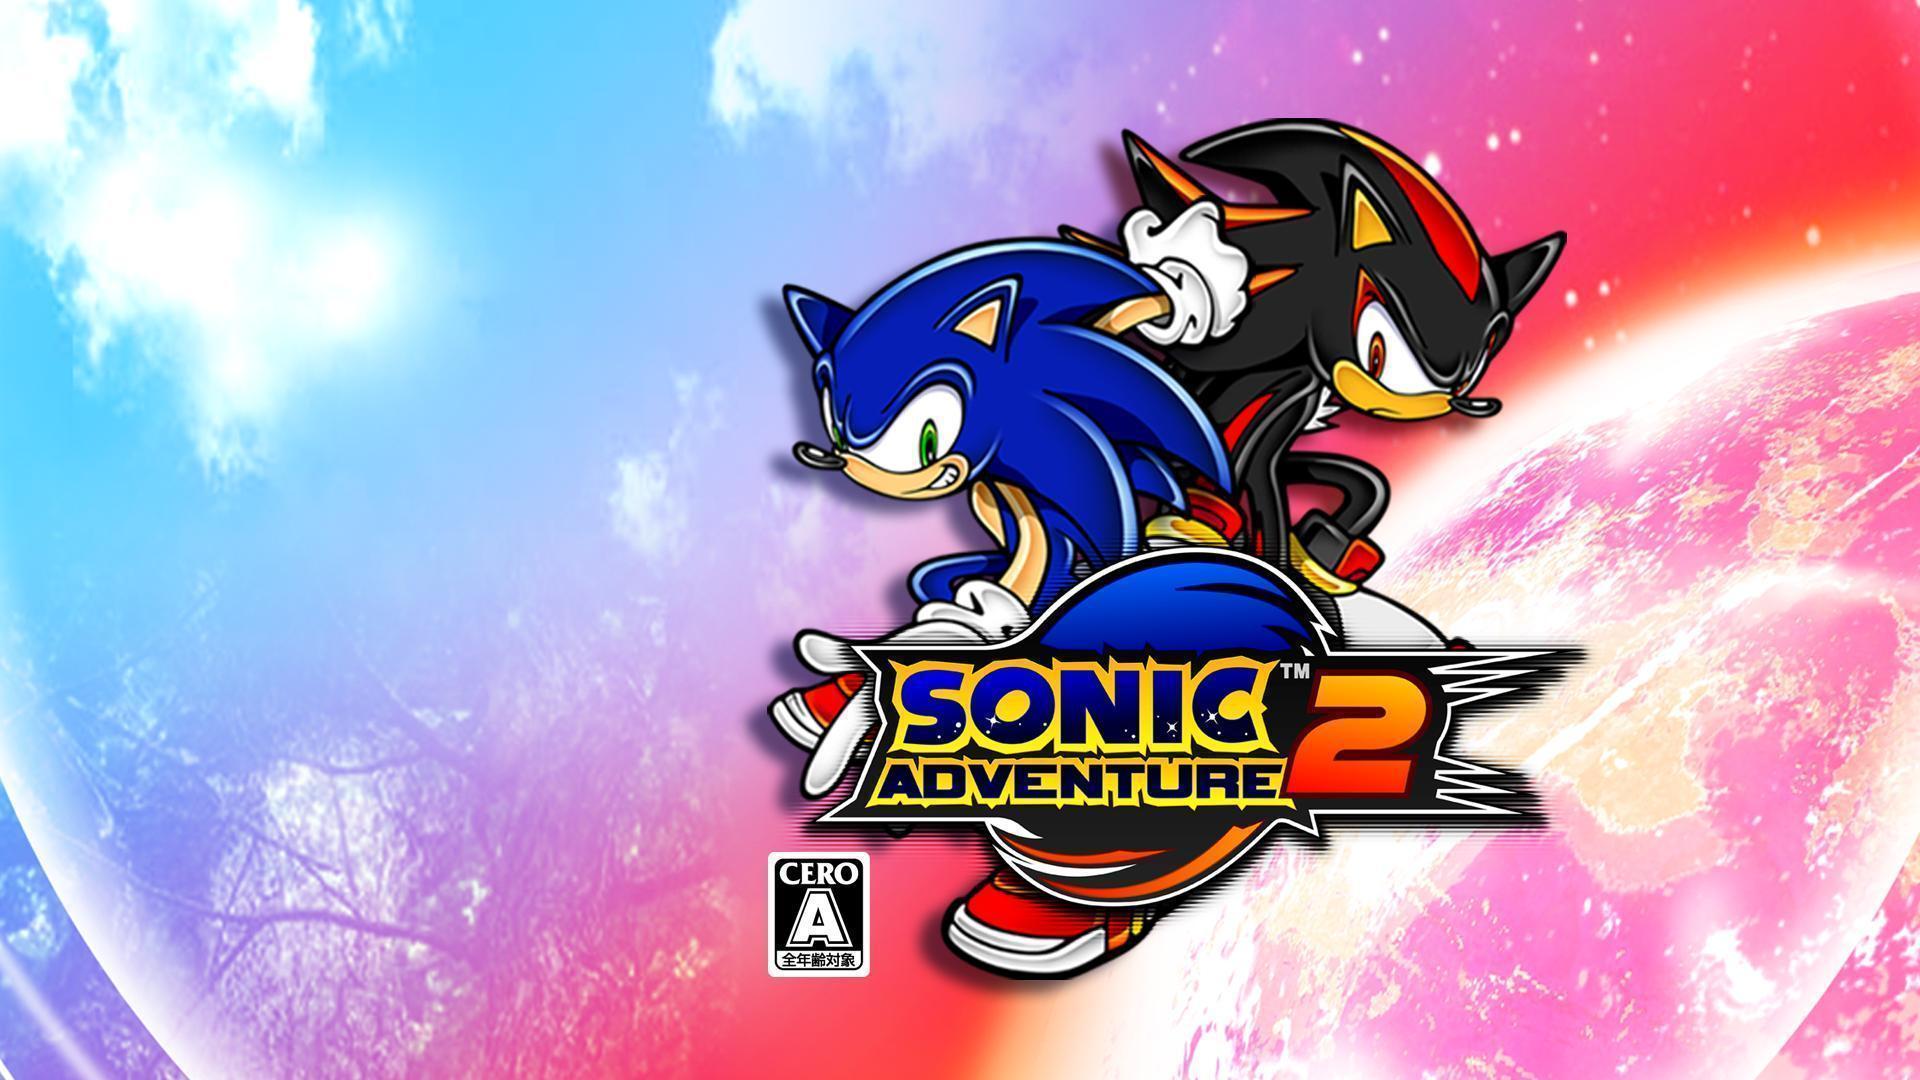 Sonic Adventure 2 Wallpapers - Wallpaper Cave